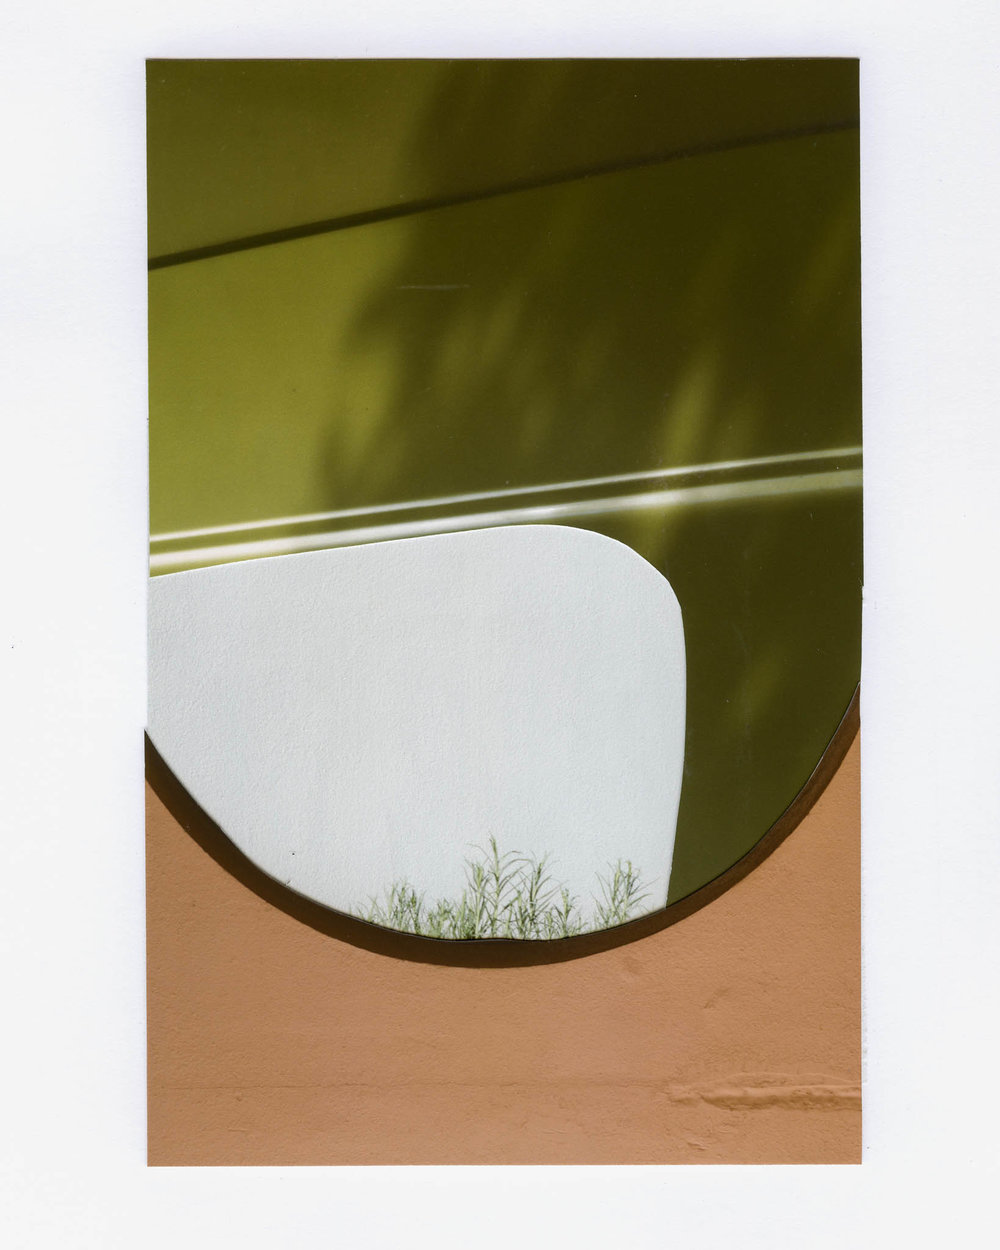 squarespace-21.jpg